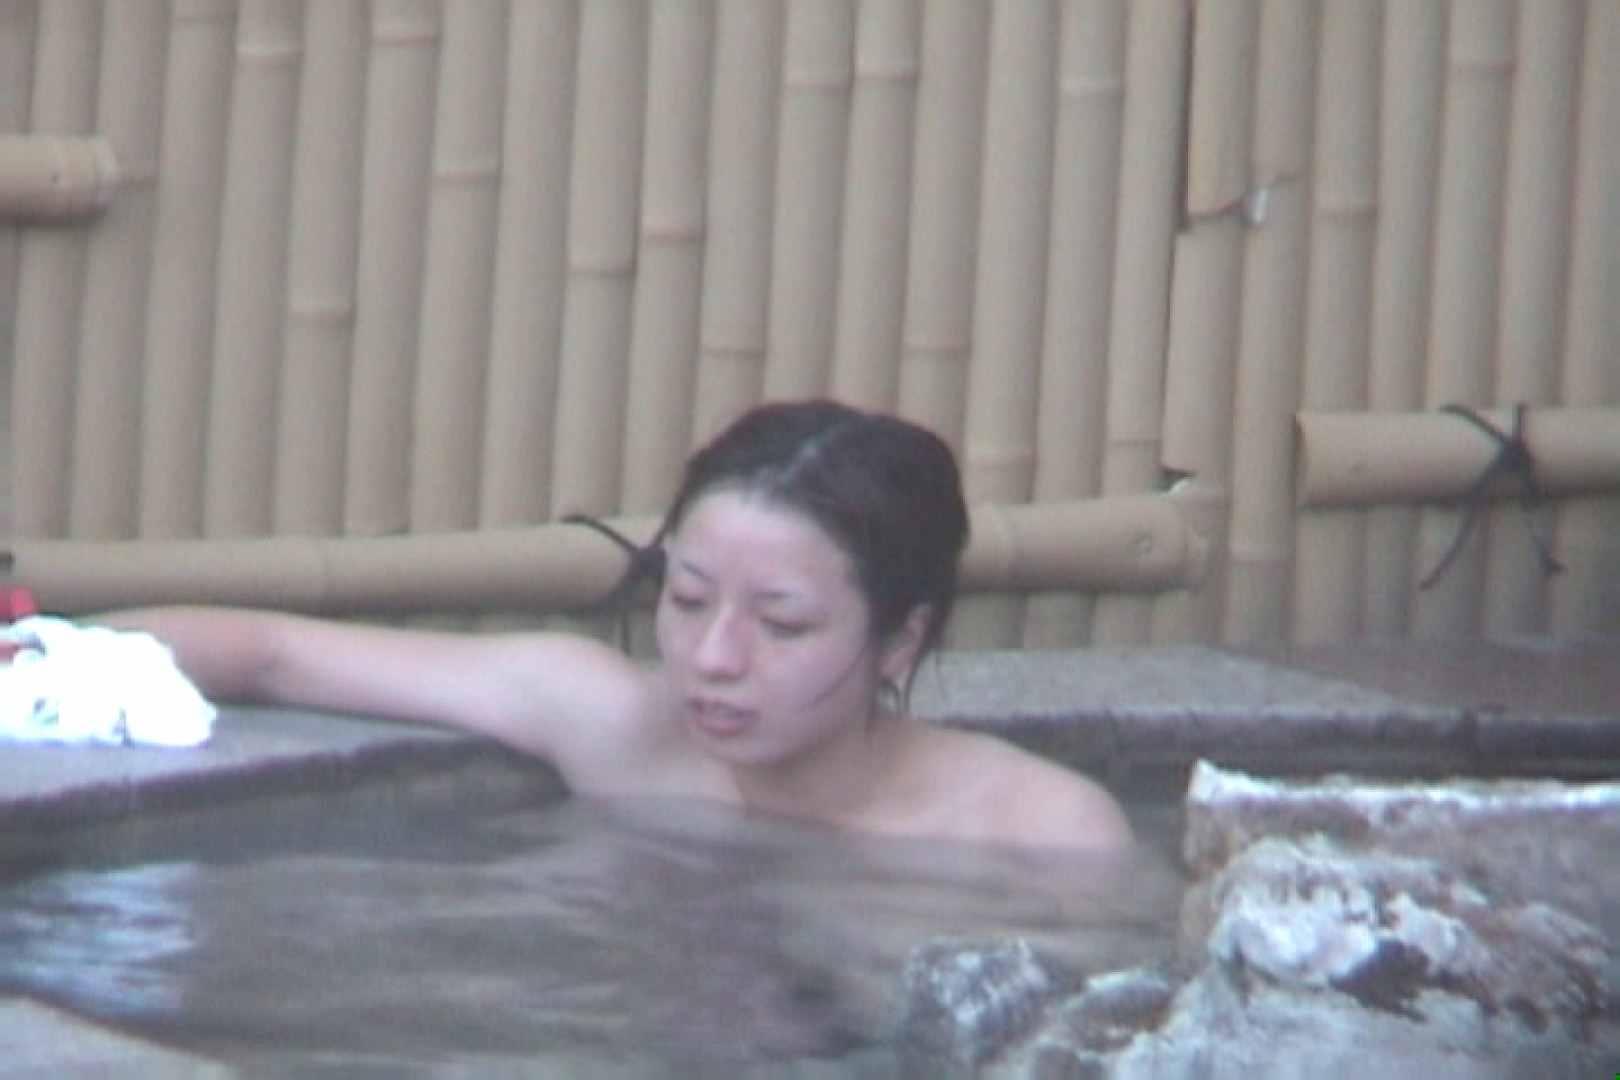 Aquaな露天風呂Vol.608 HなOL | 盗撮  89pic 48